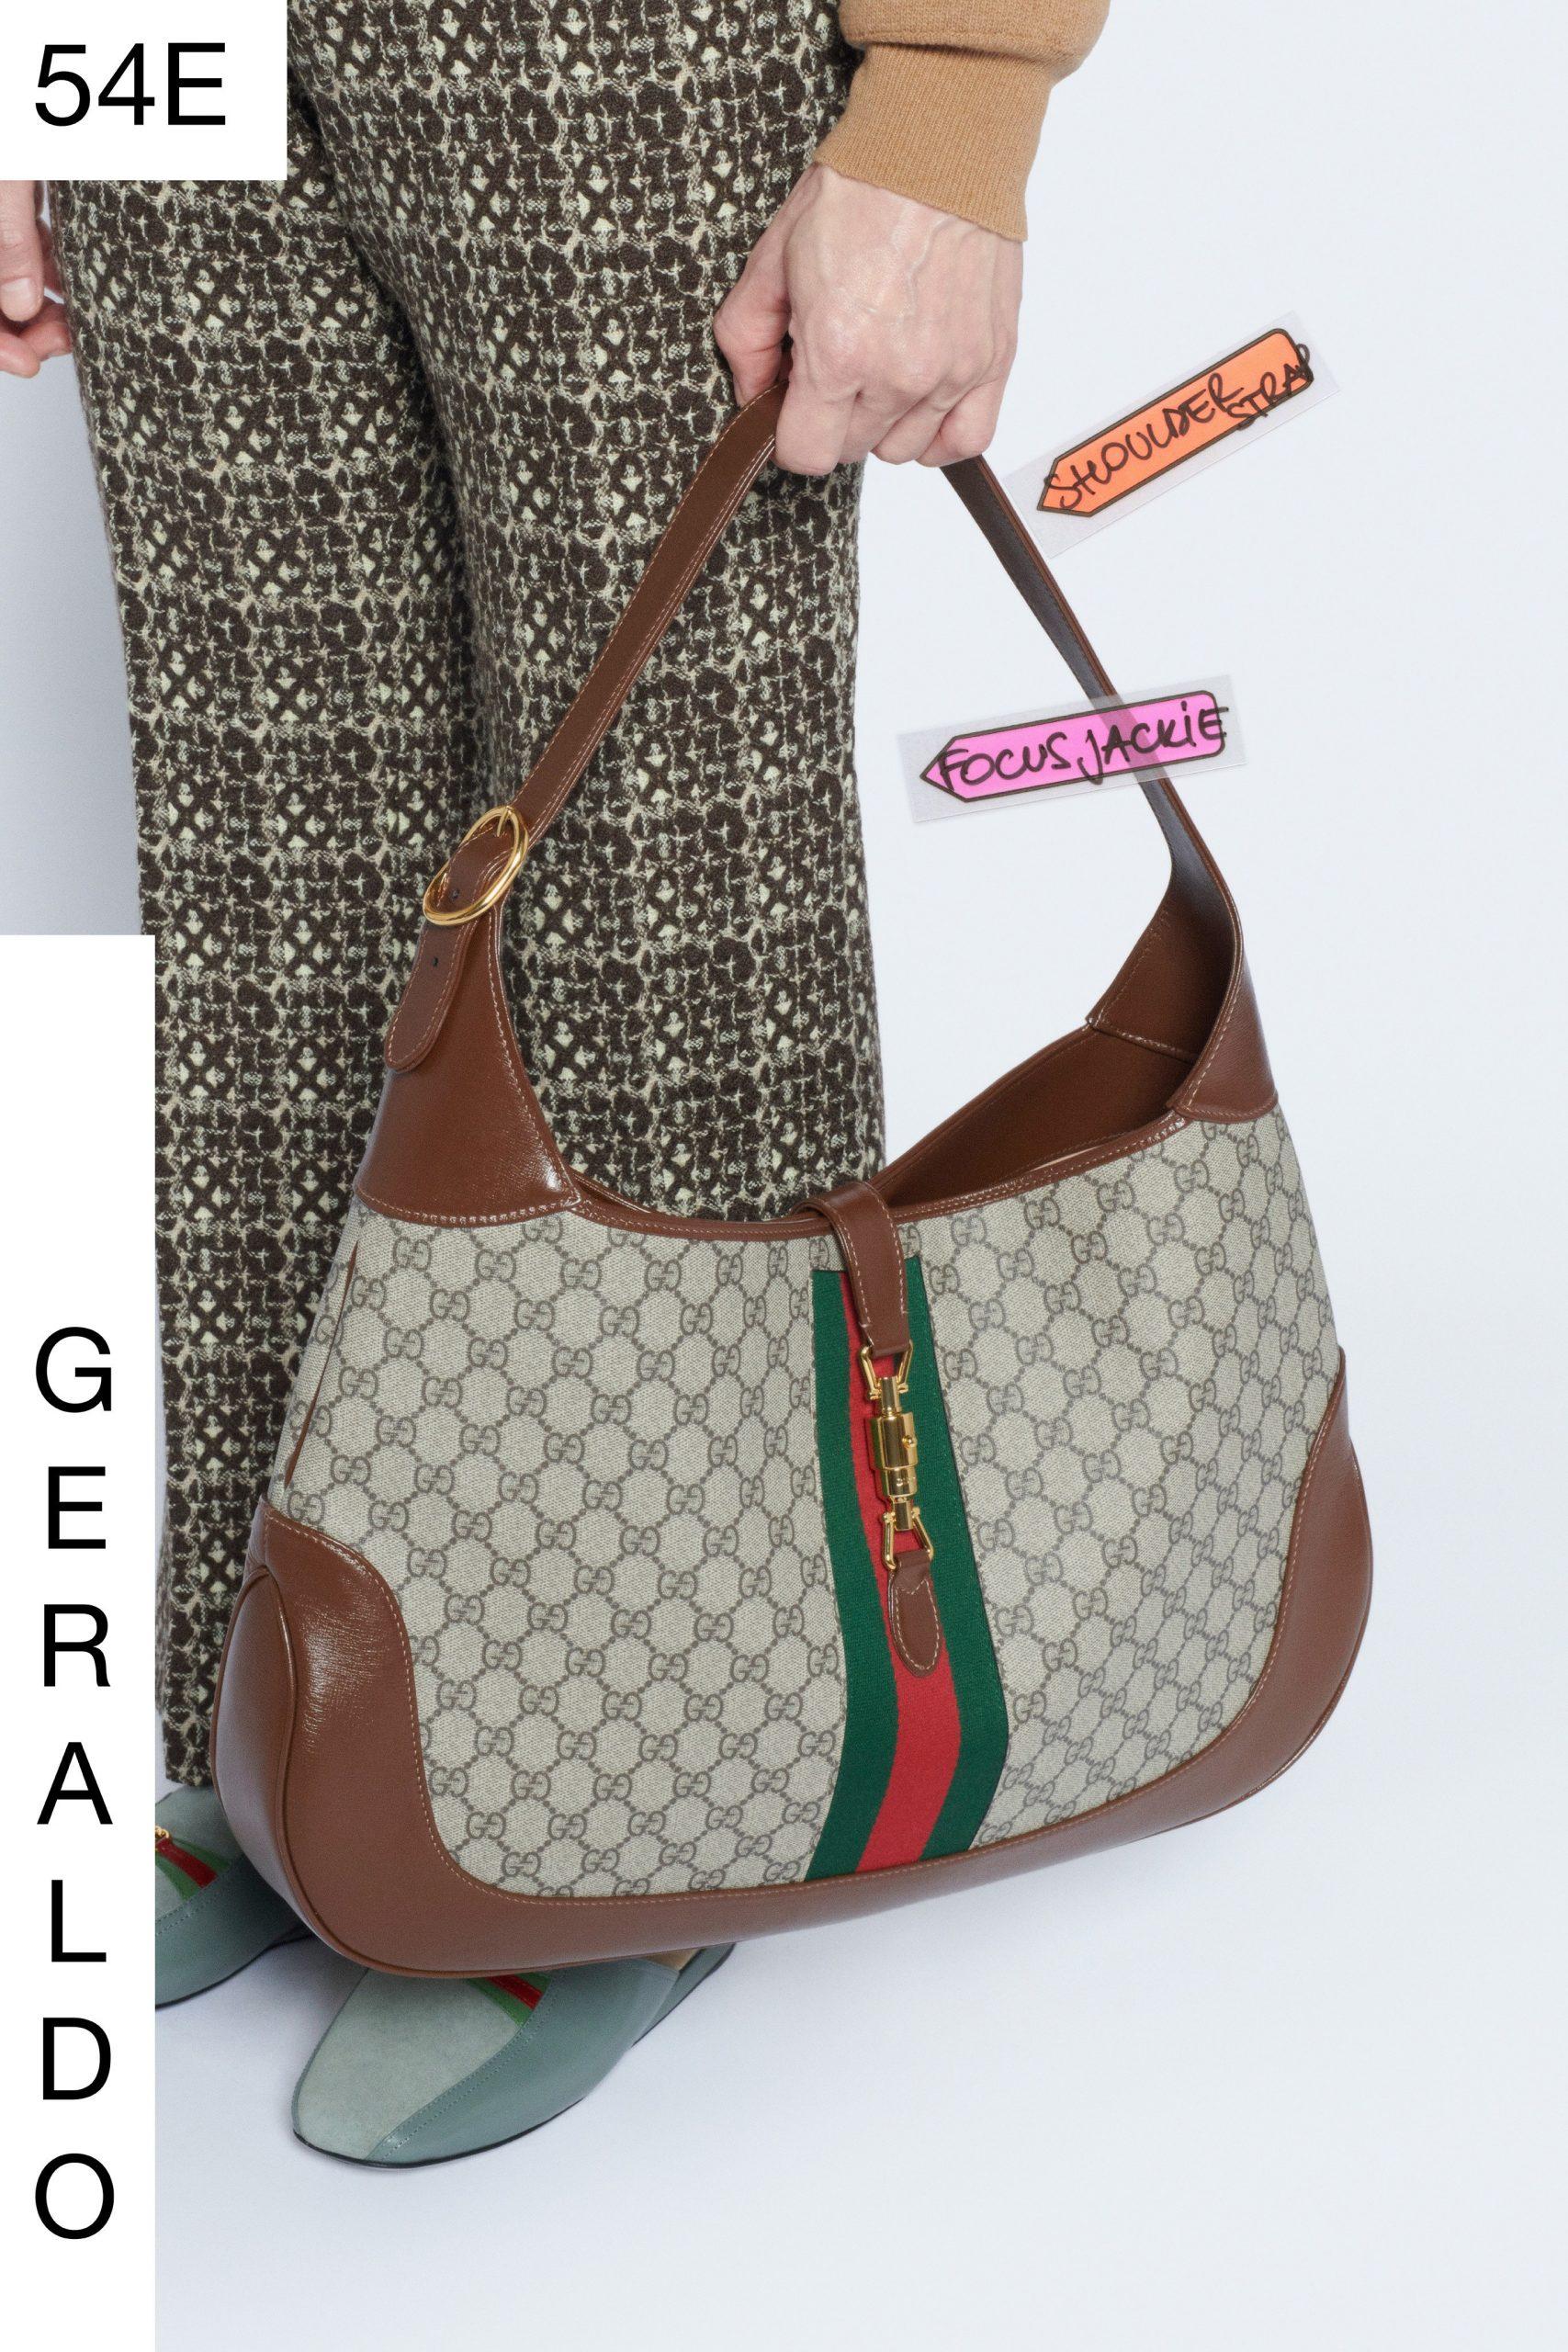 00095-Gucci-Resort-2021